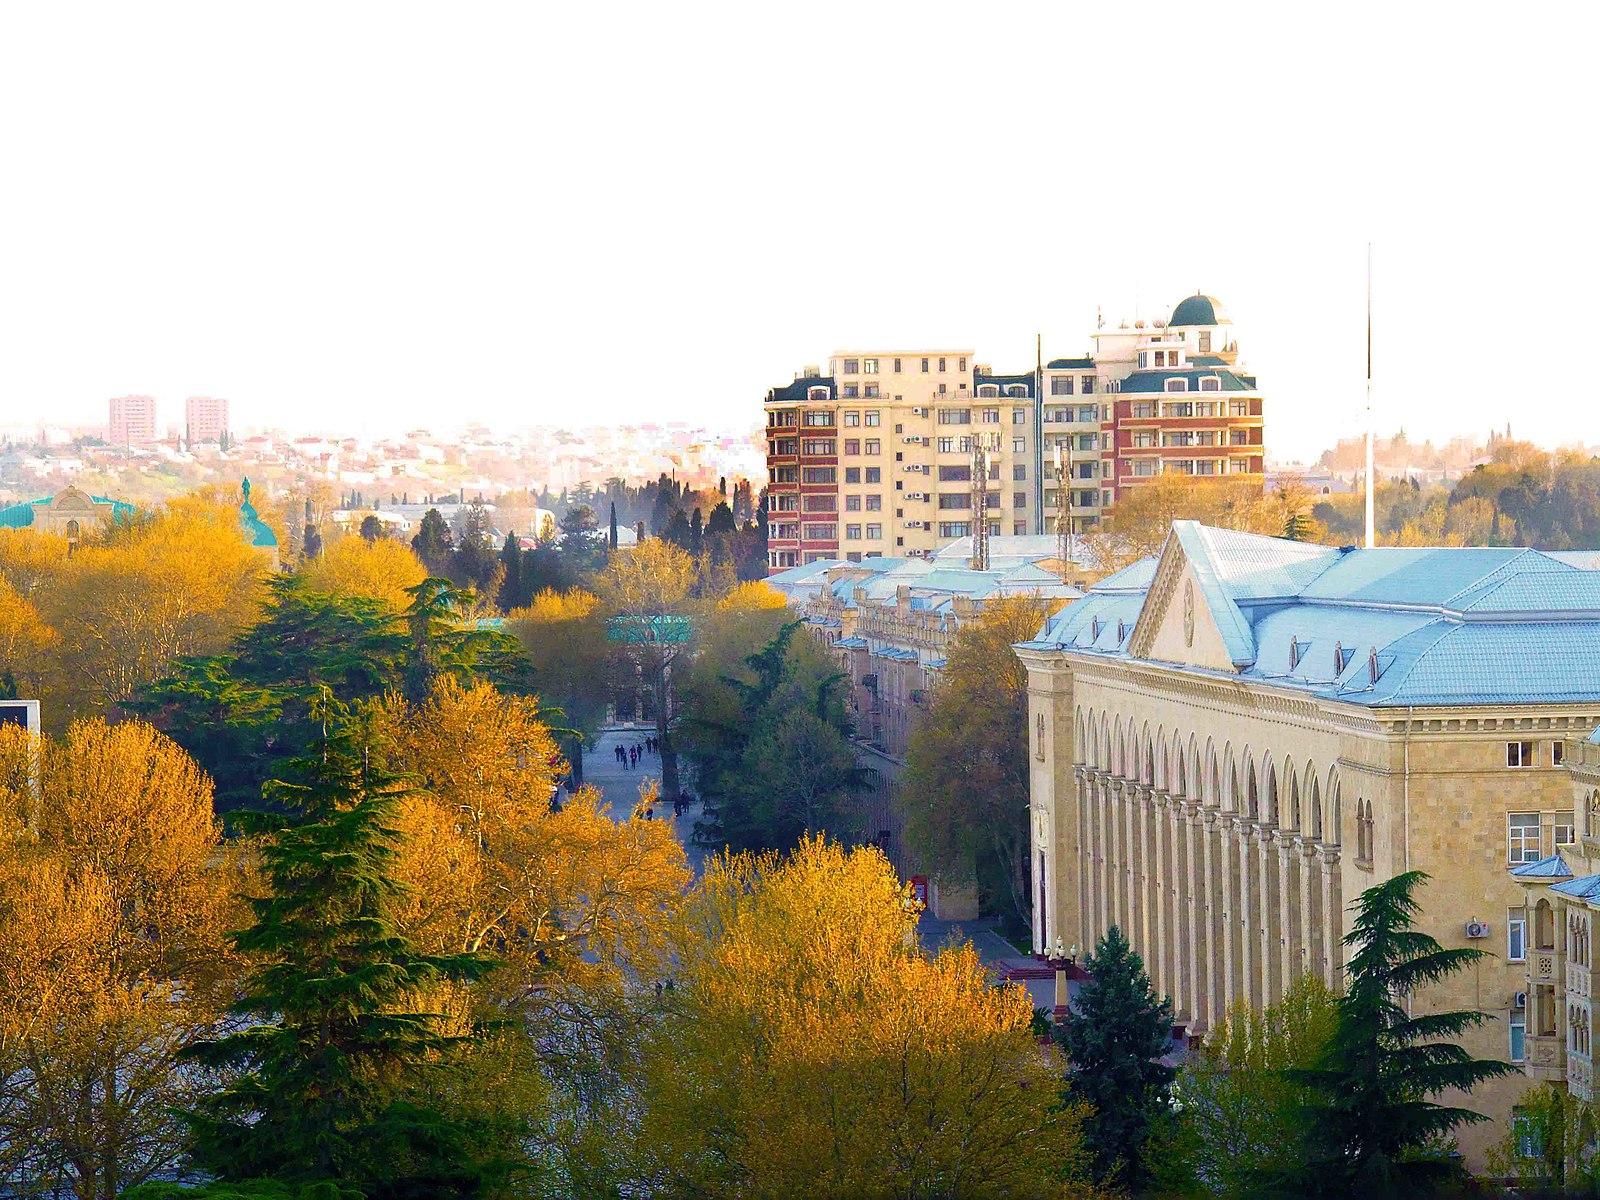 City of Ganja, Azerbaijan